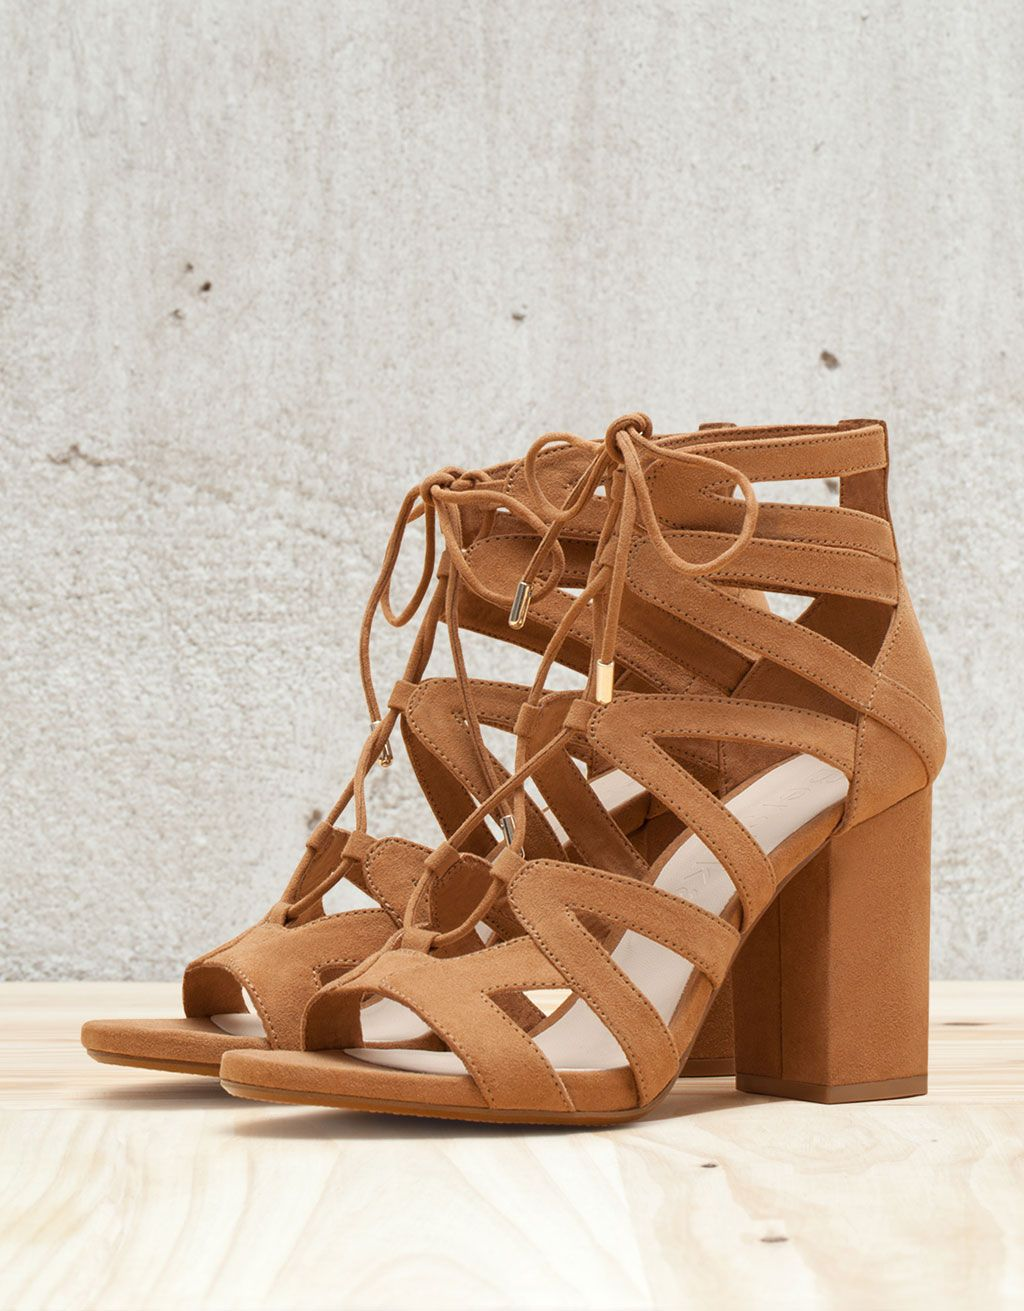 sandales à talons avec cordon - voir tout - bershka france